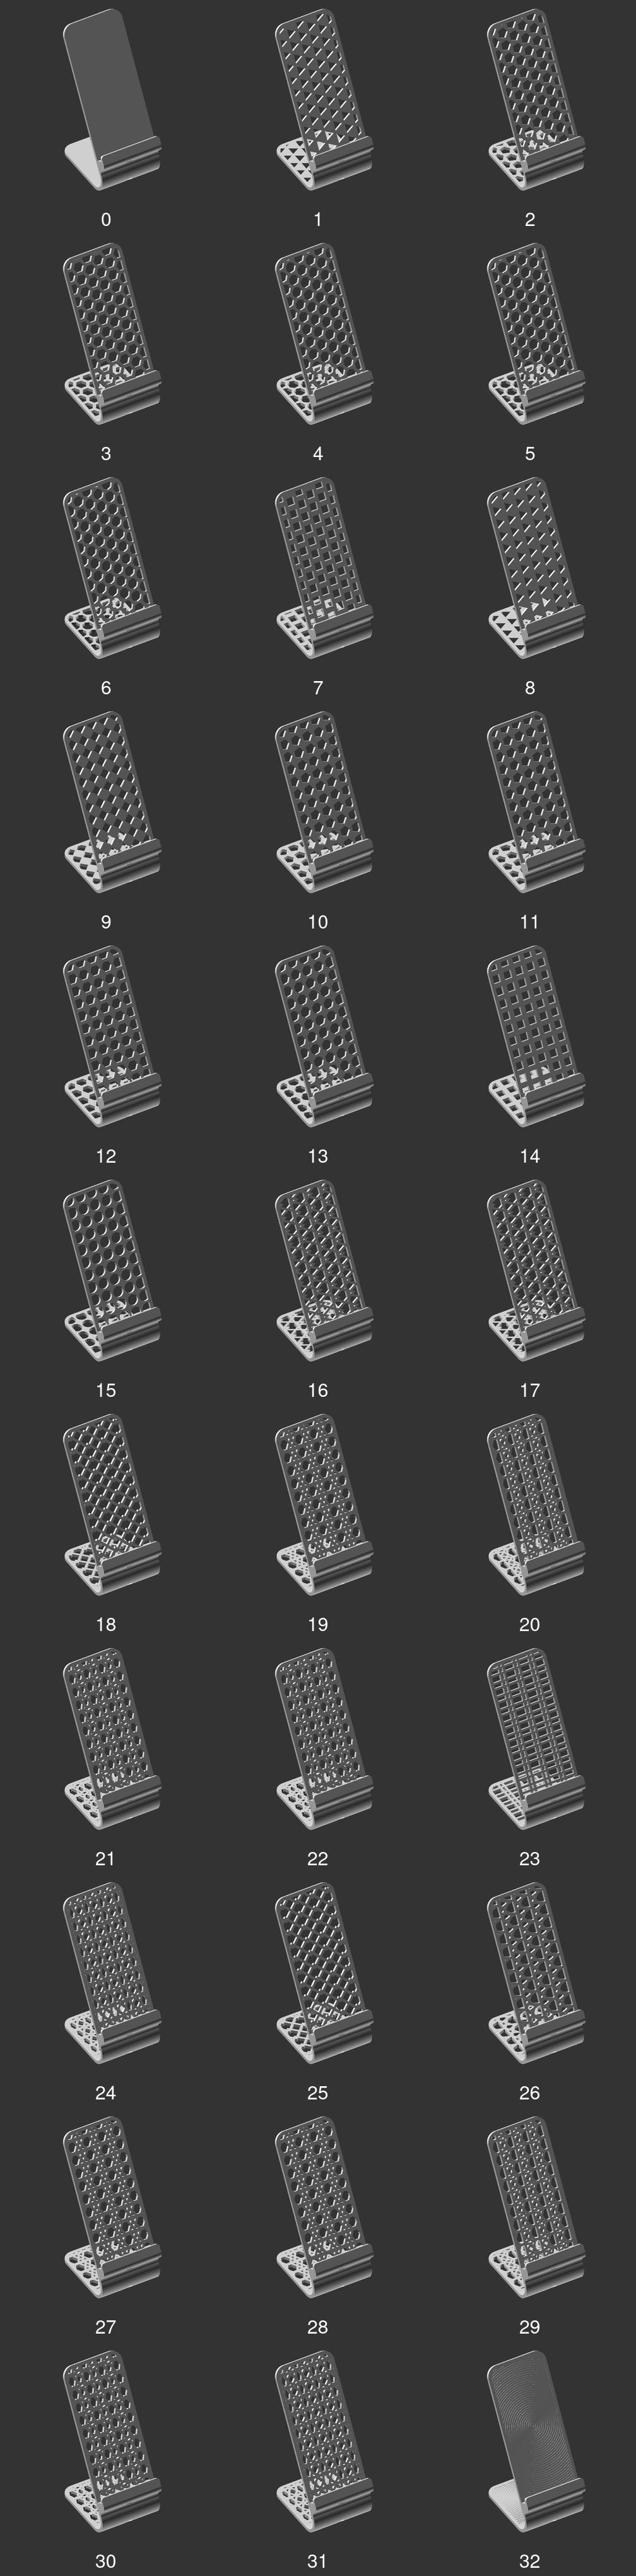 Preset patterns